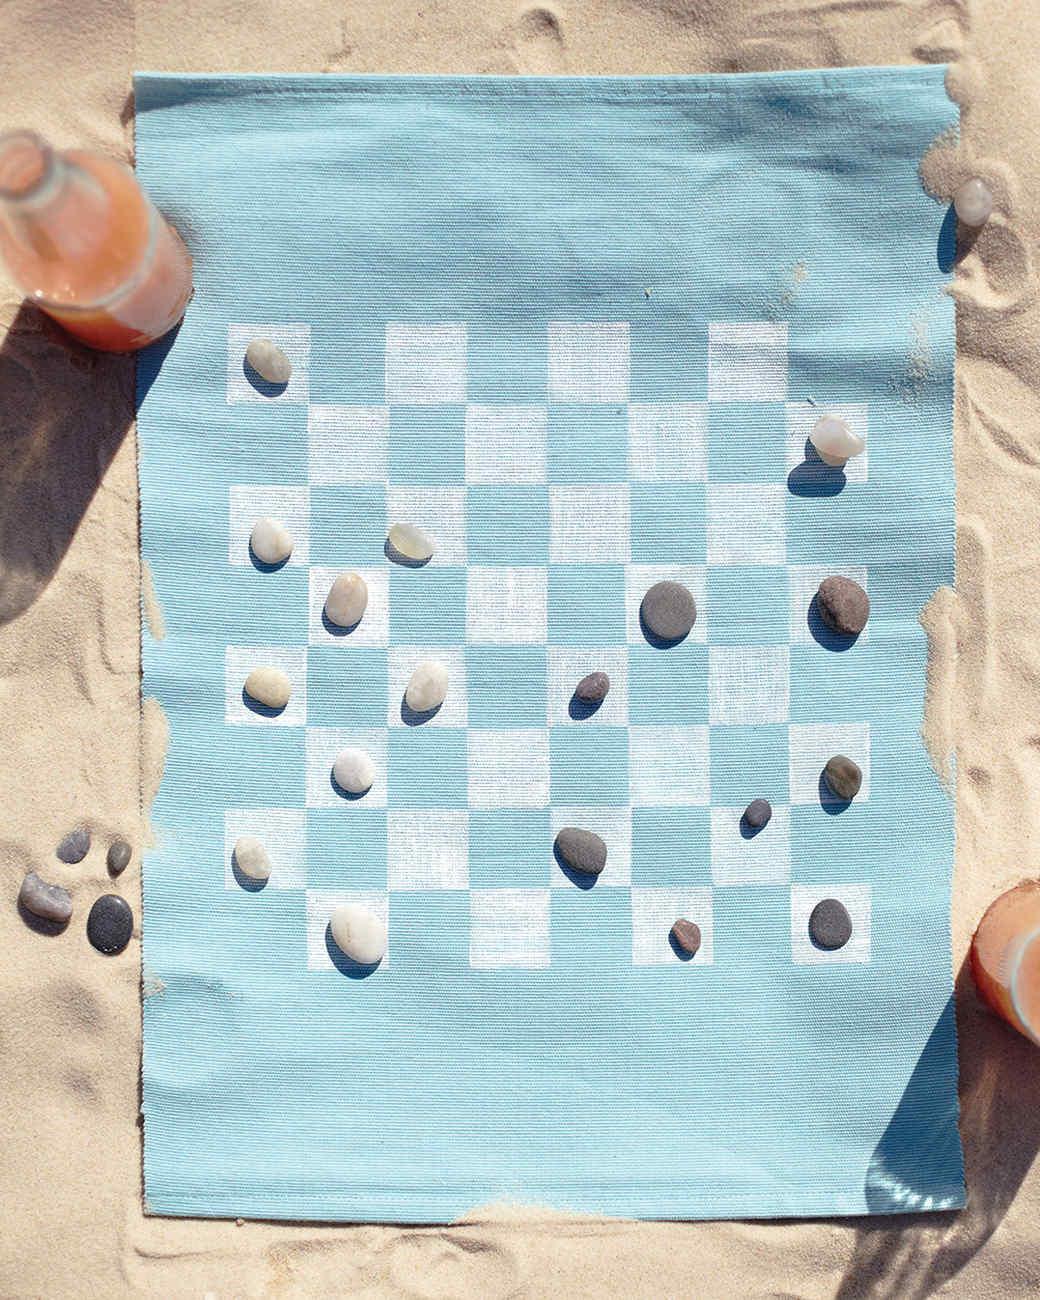 mld105794_0810_games6.jpg